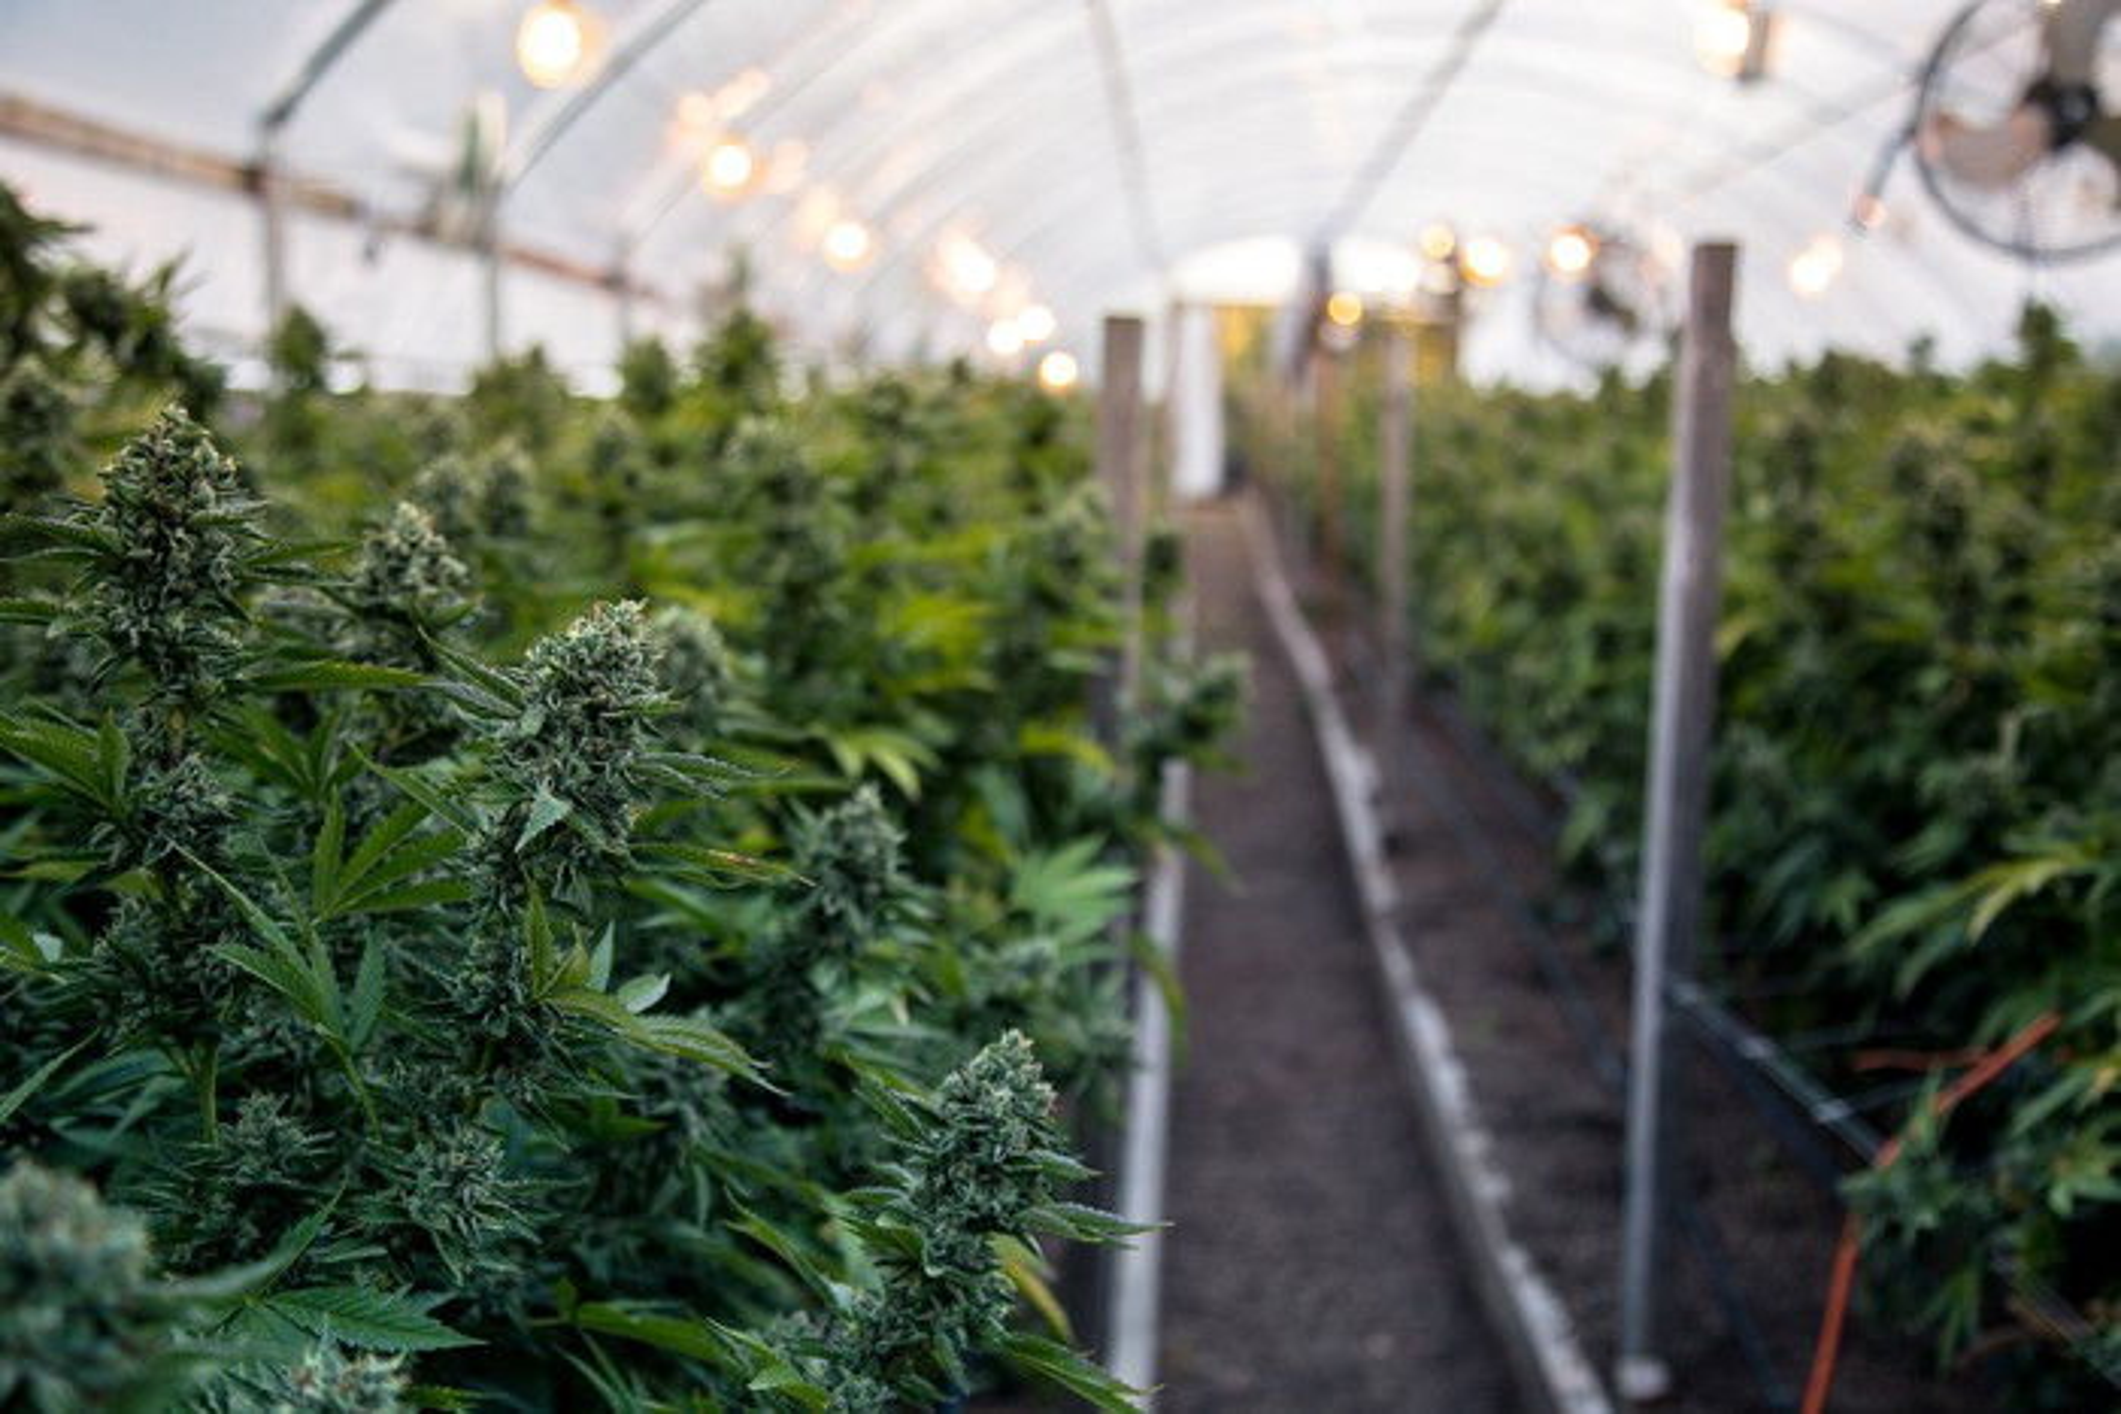 An indoor cannabis grow greenhouse.